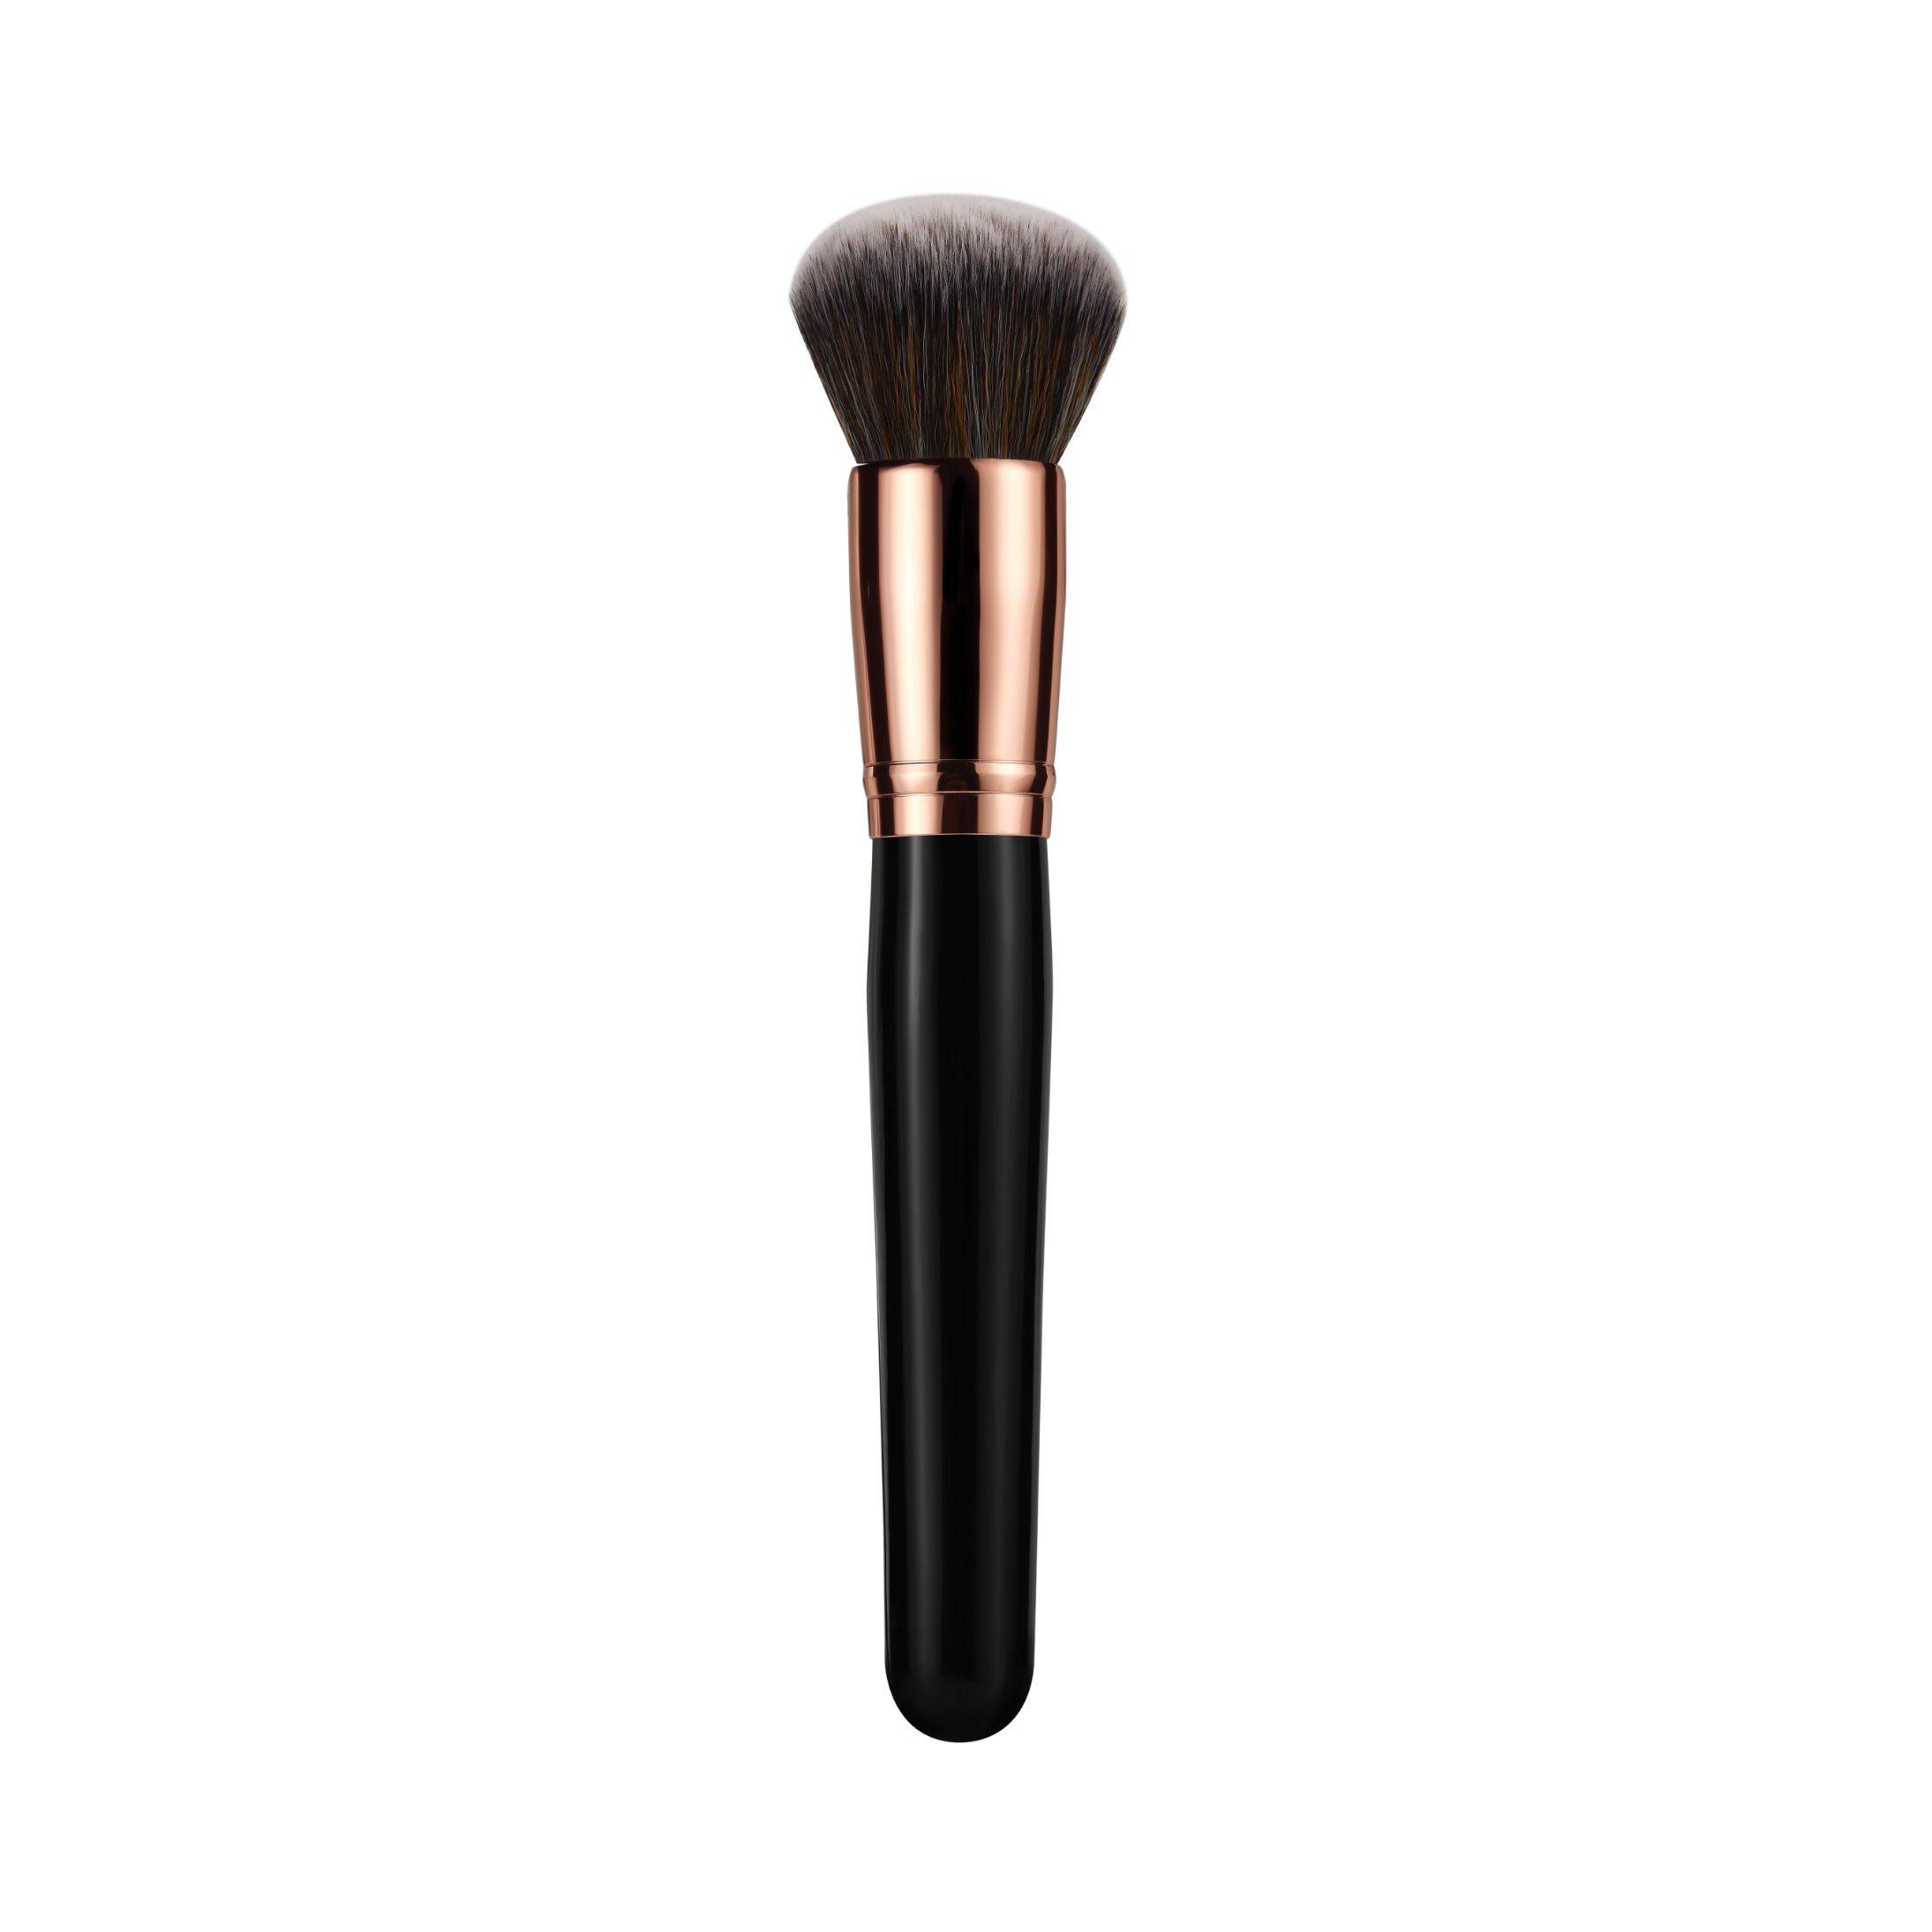 Synthetic Hair Makeup Brush Vegan Multifunction Makeup Brush with Bag